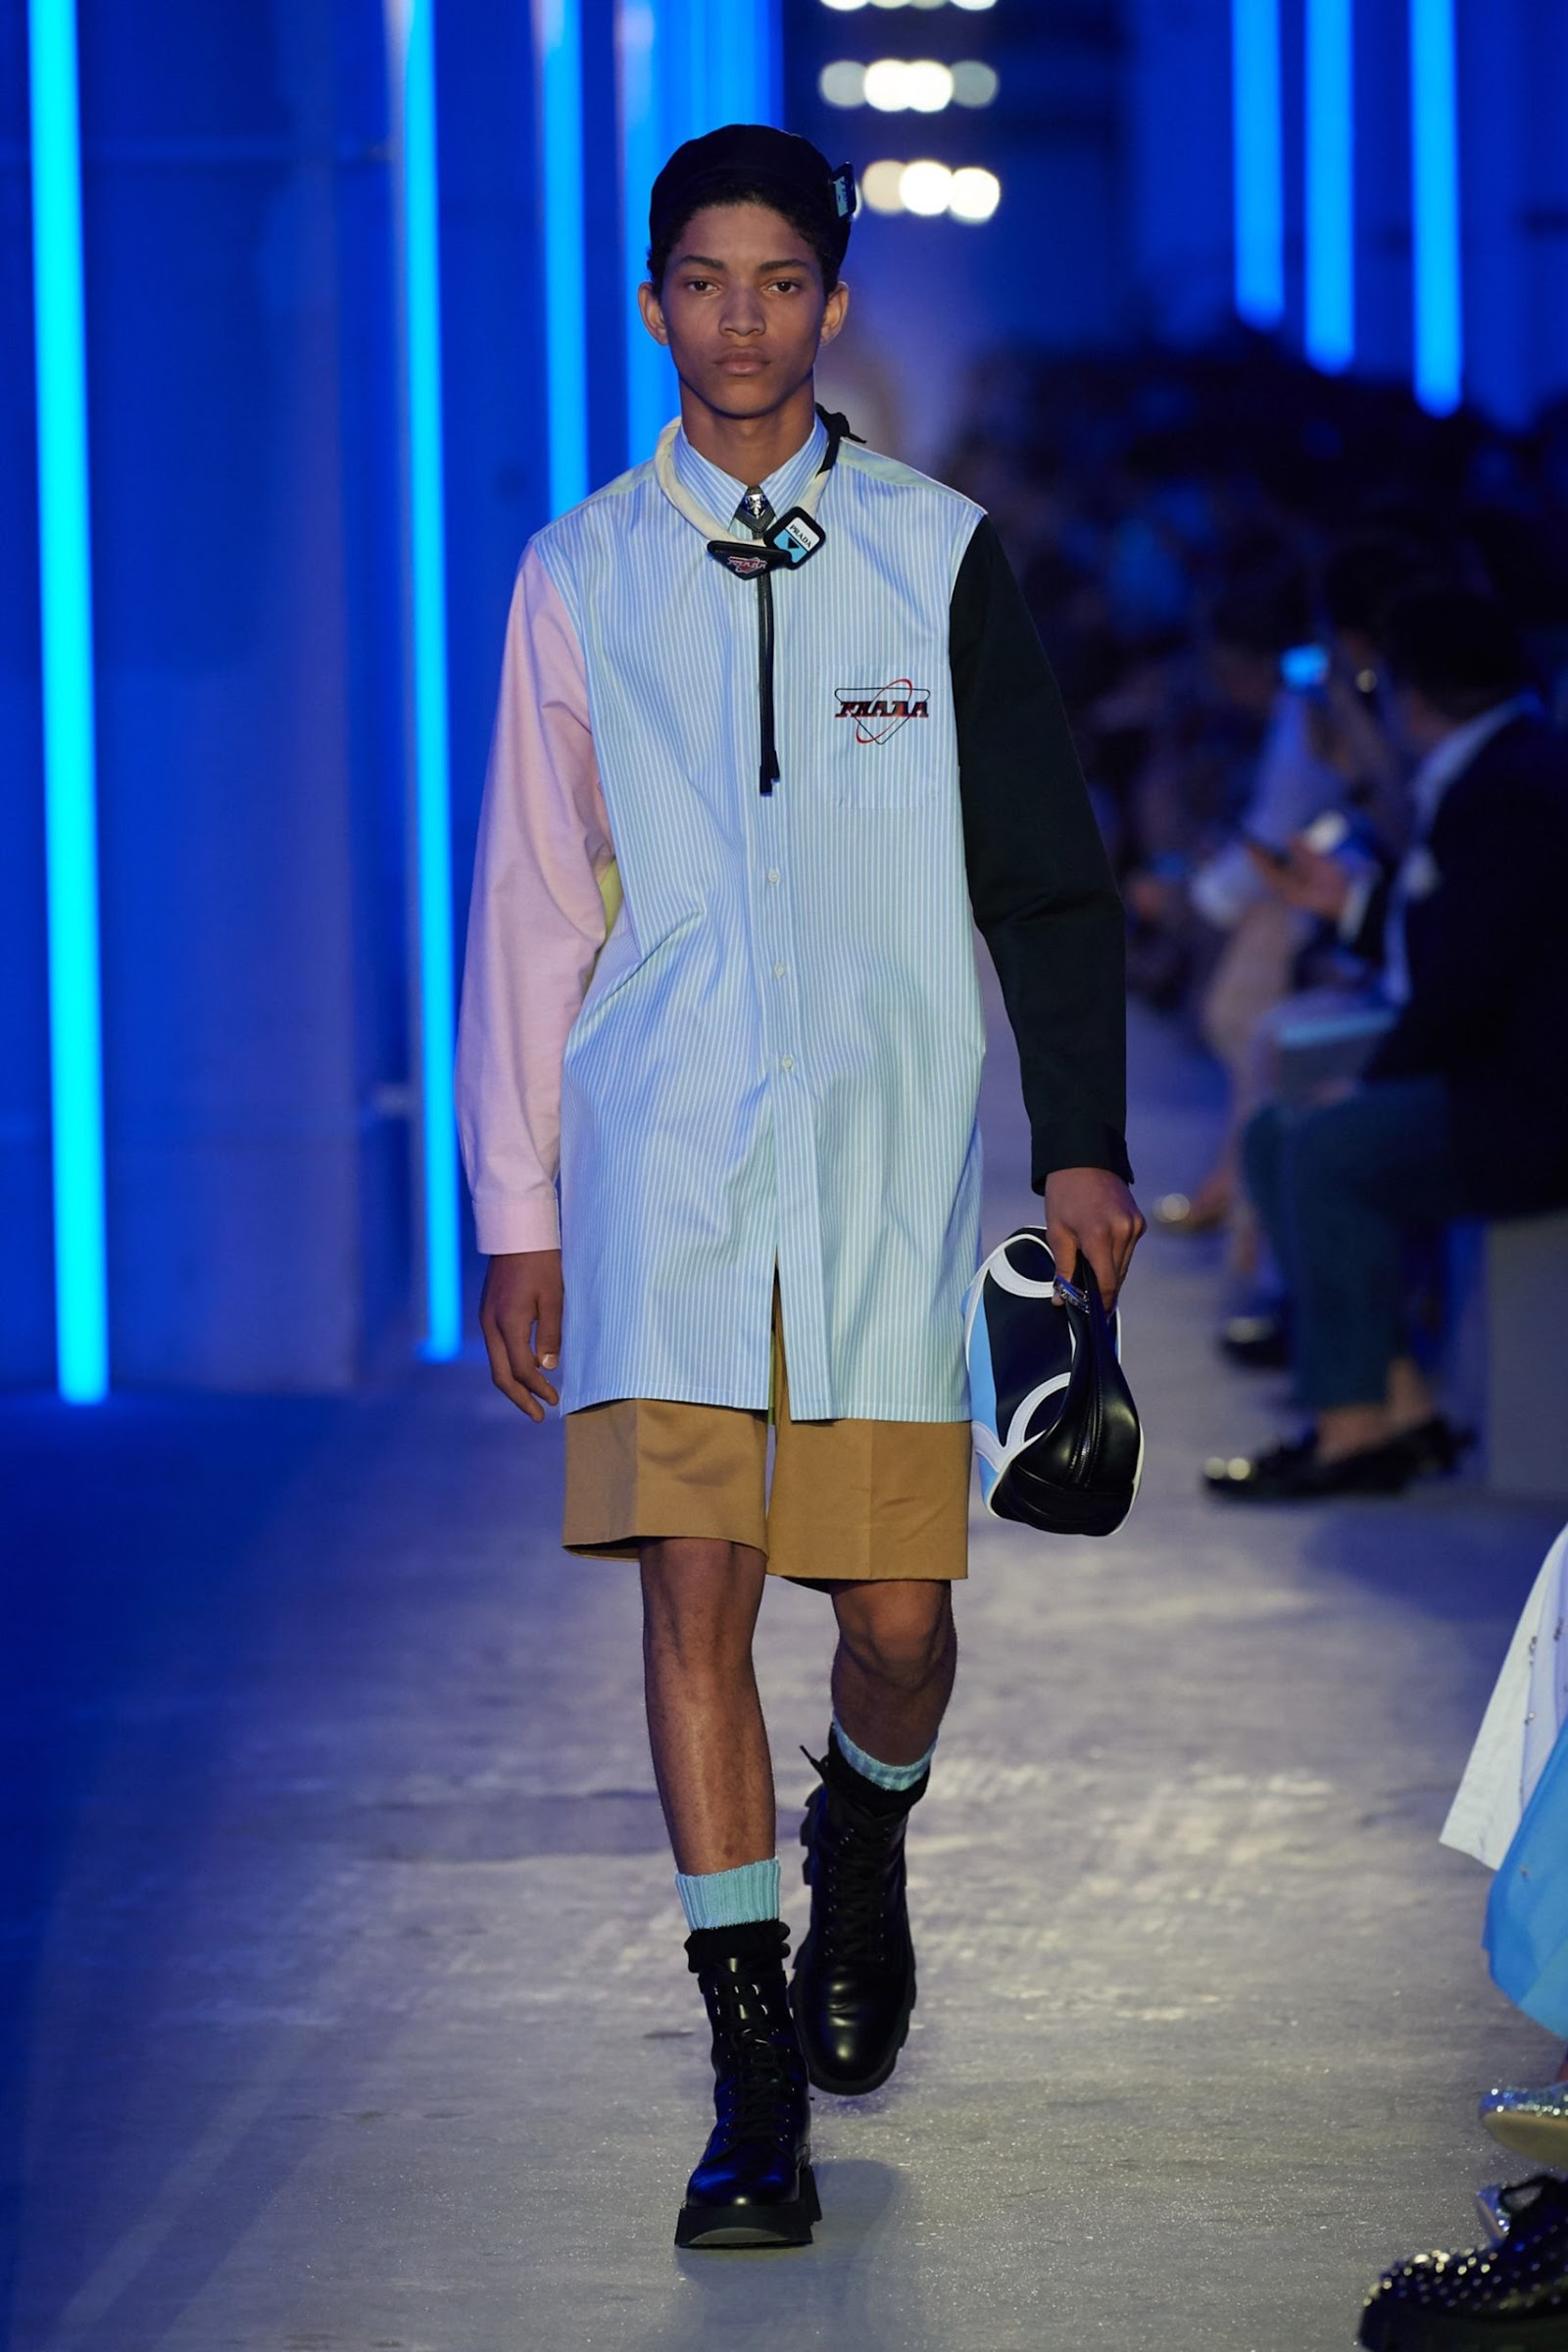 Prada-Spring-2020-Menswear-Collection-1-scaled